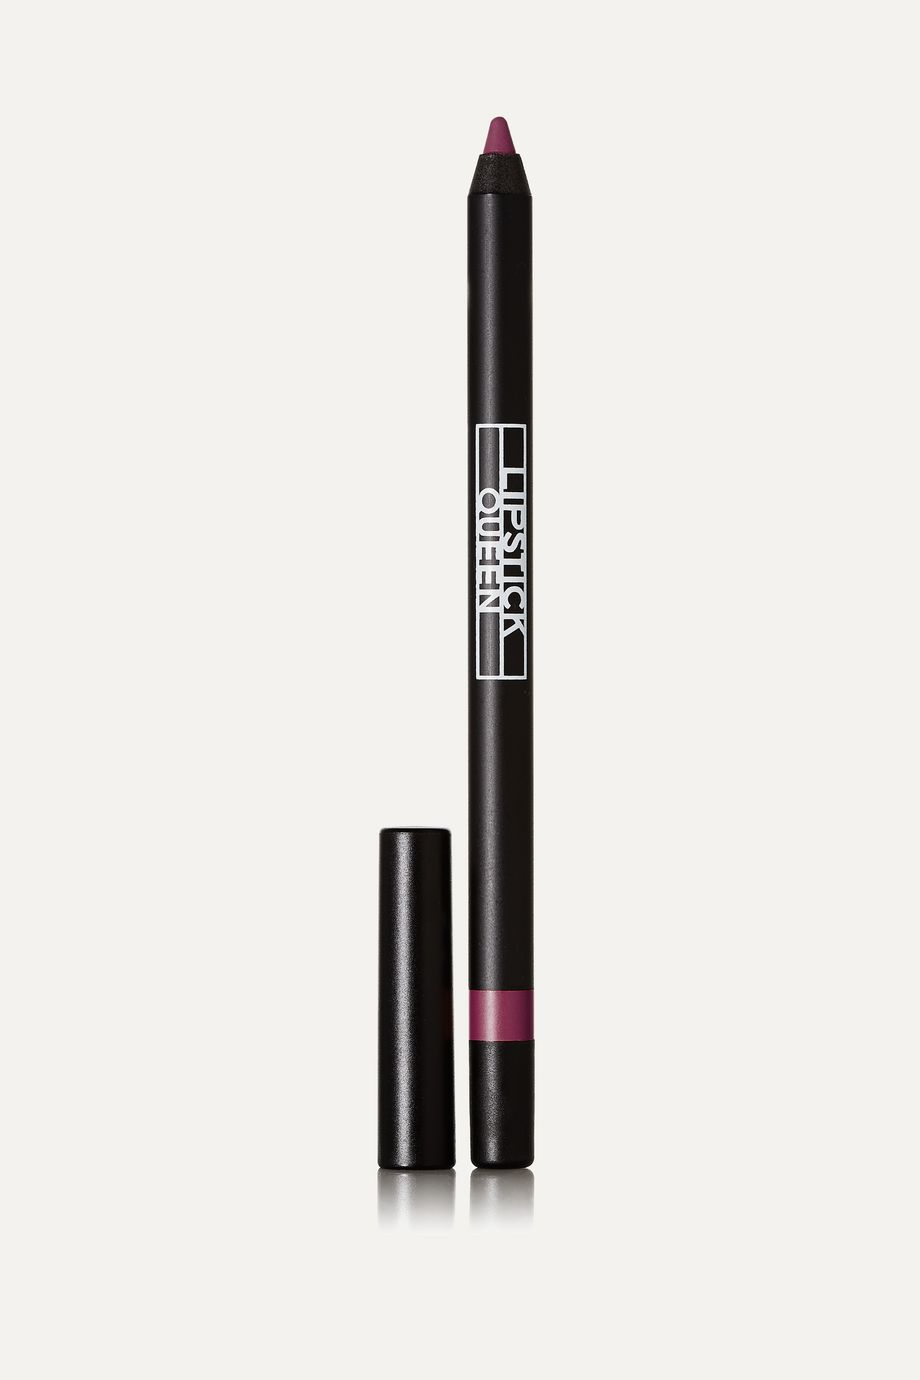 Lipstick Queen 唇线笔(色号:Wine)